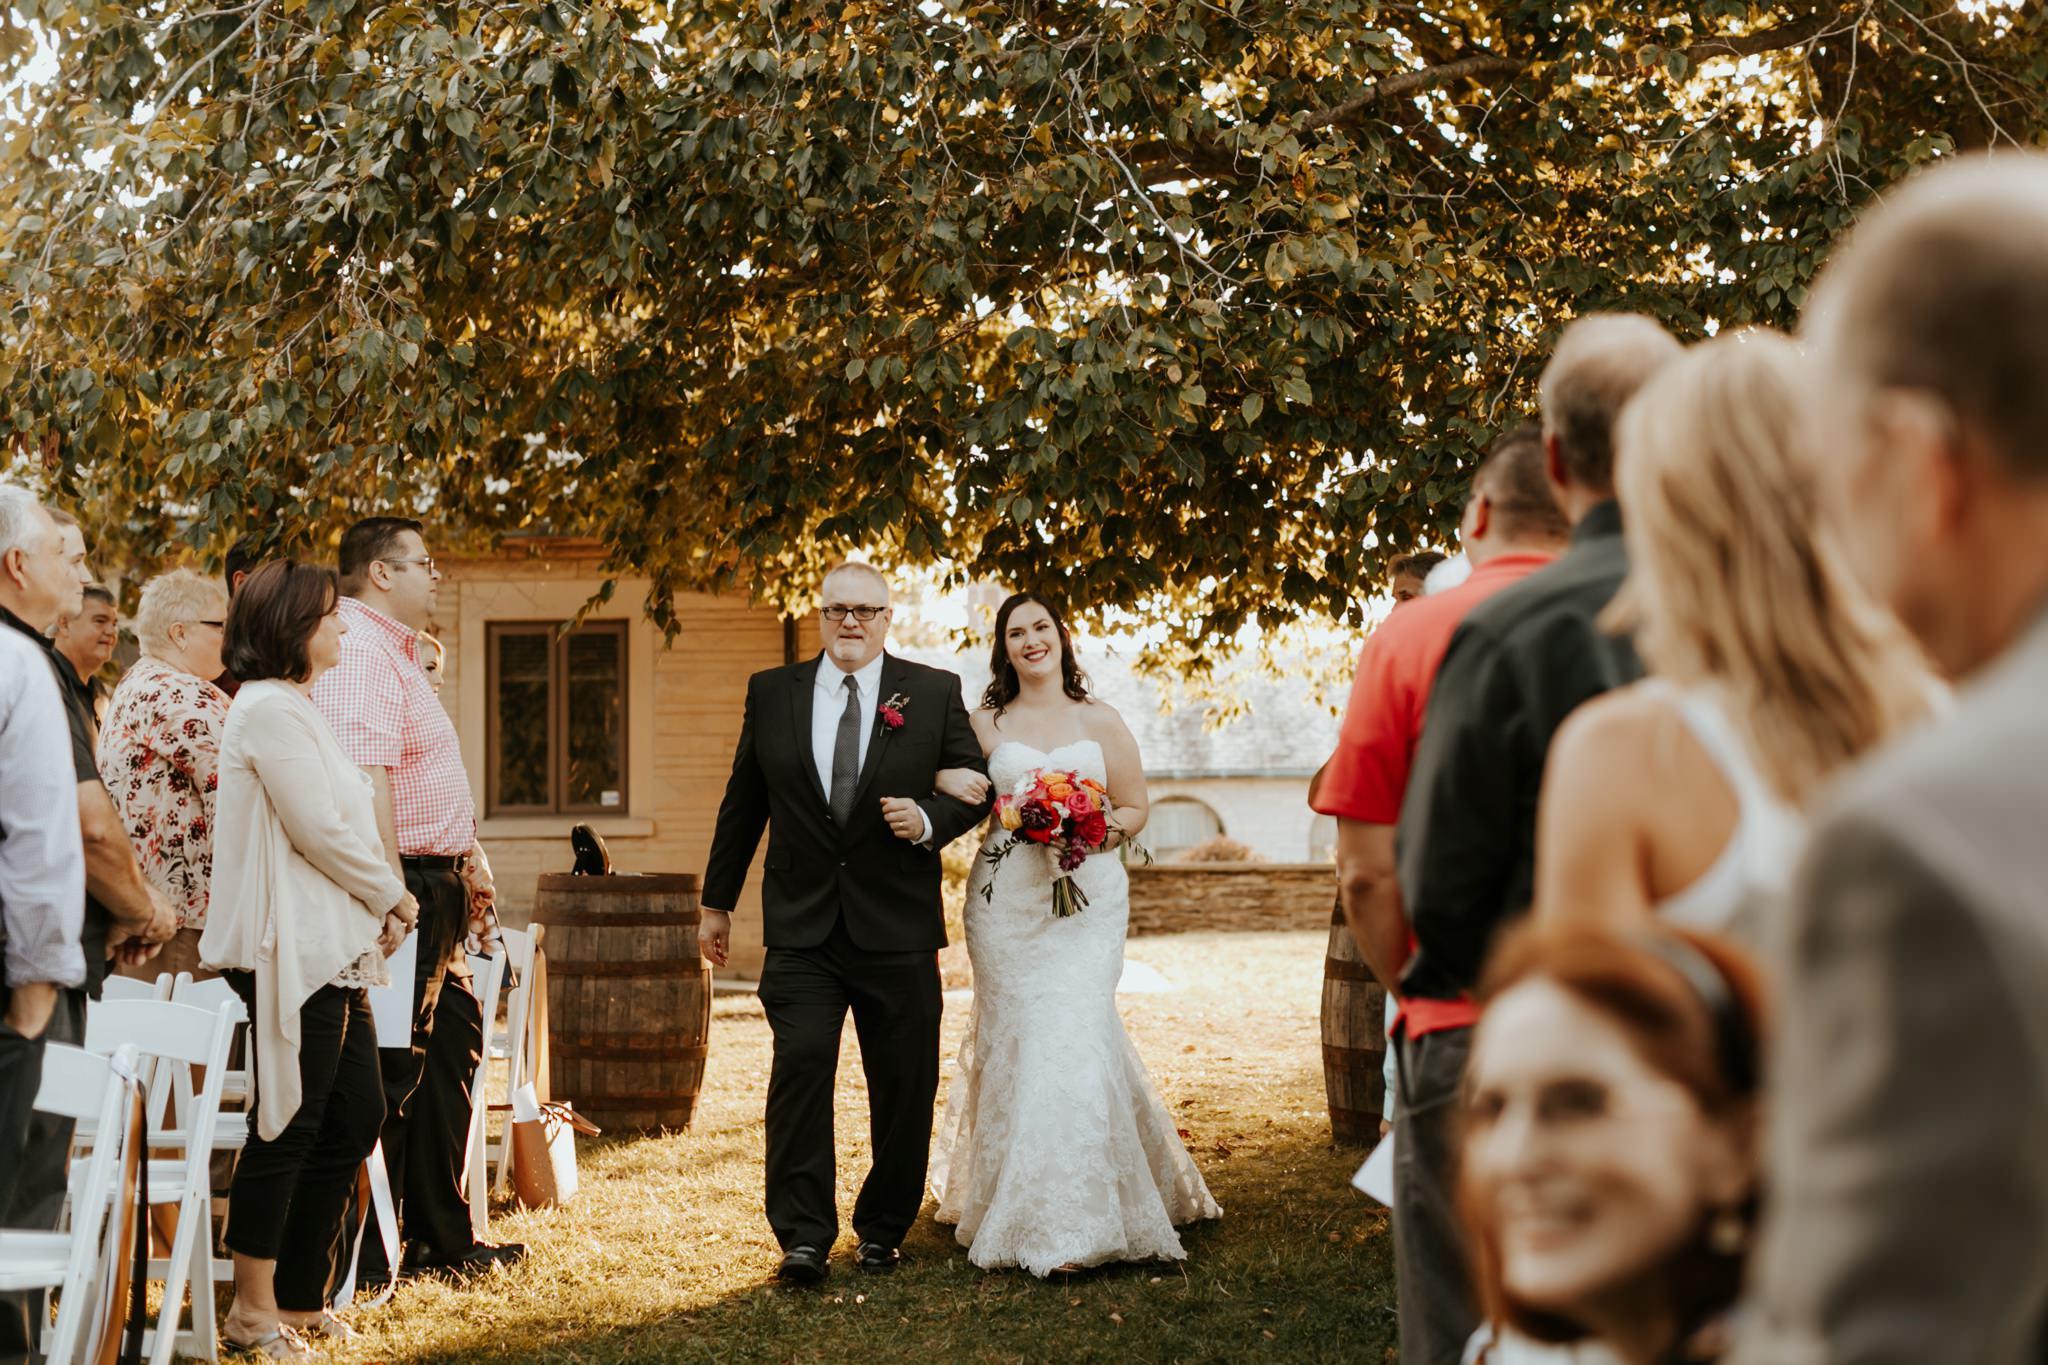 17-09-15 Lindsey and Brandon Wedding Edited-657_WEB.jpg